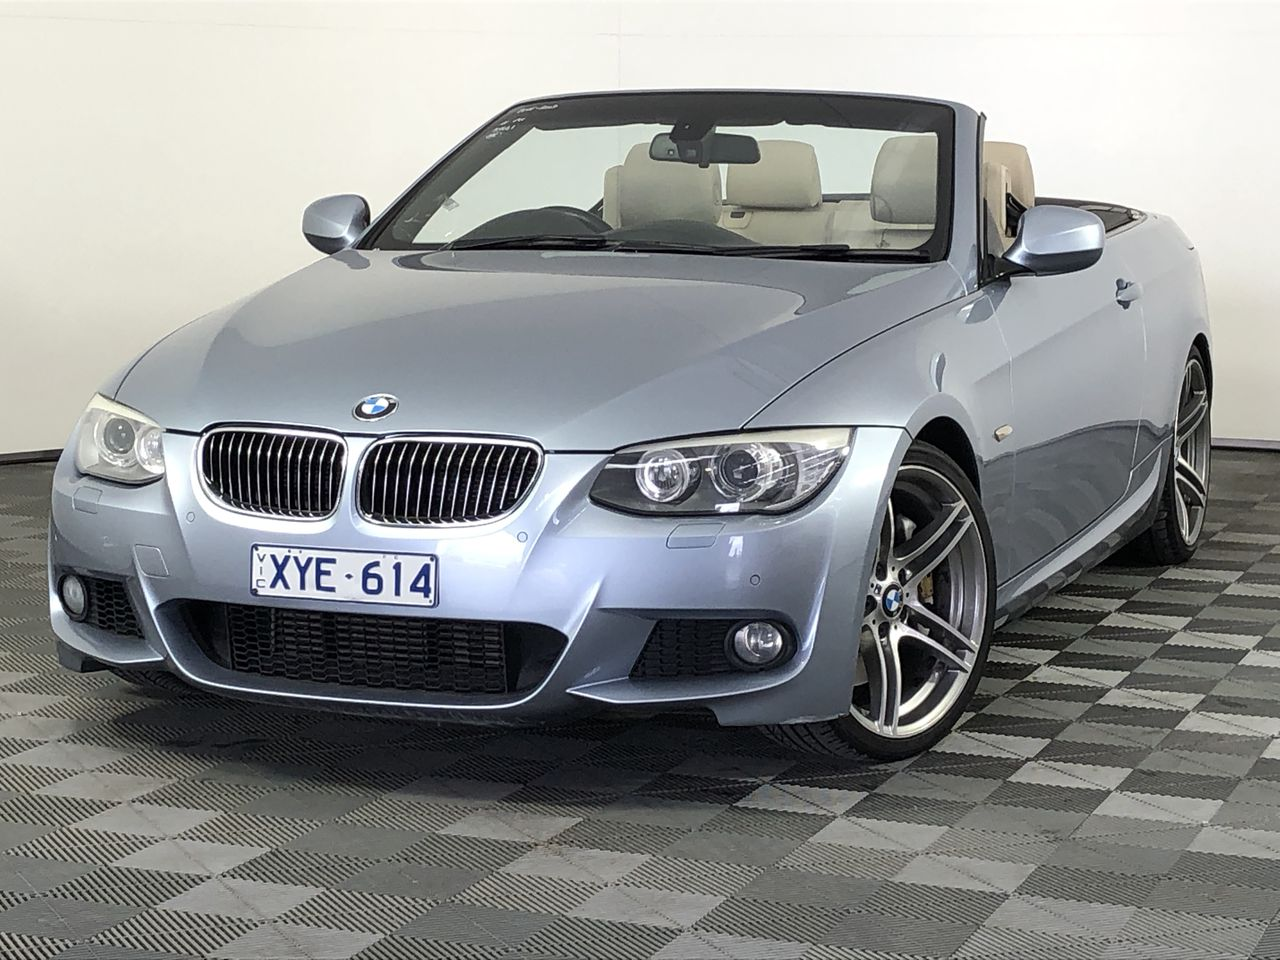 2010 BMW 3 35i M SPORT E93 Automatic Convertible